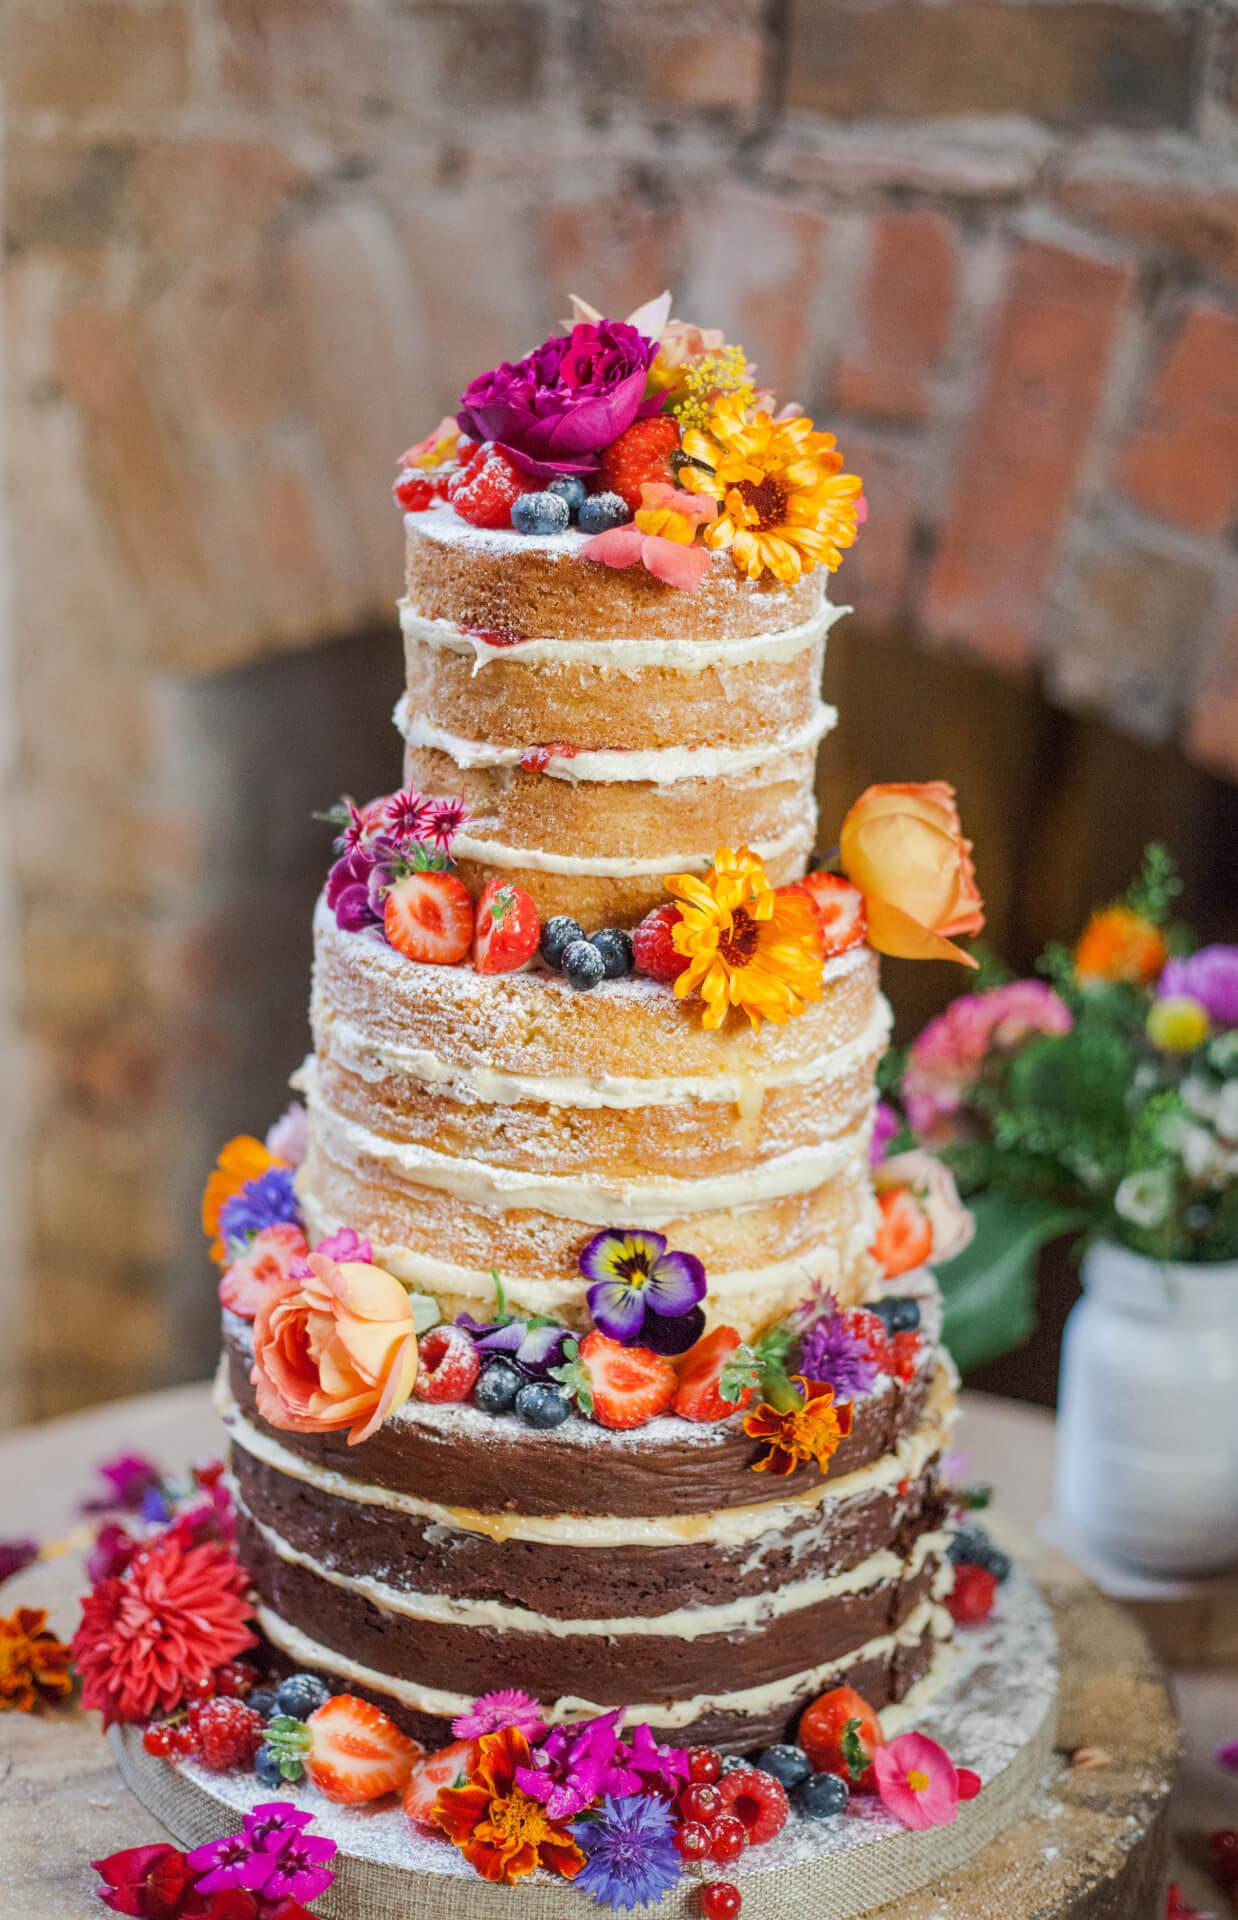 Wedding Cakes Flower  Edible Flowers for Naked Wedding Cakes Fresh Edible